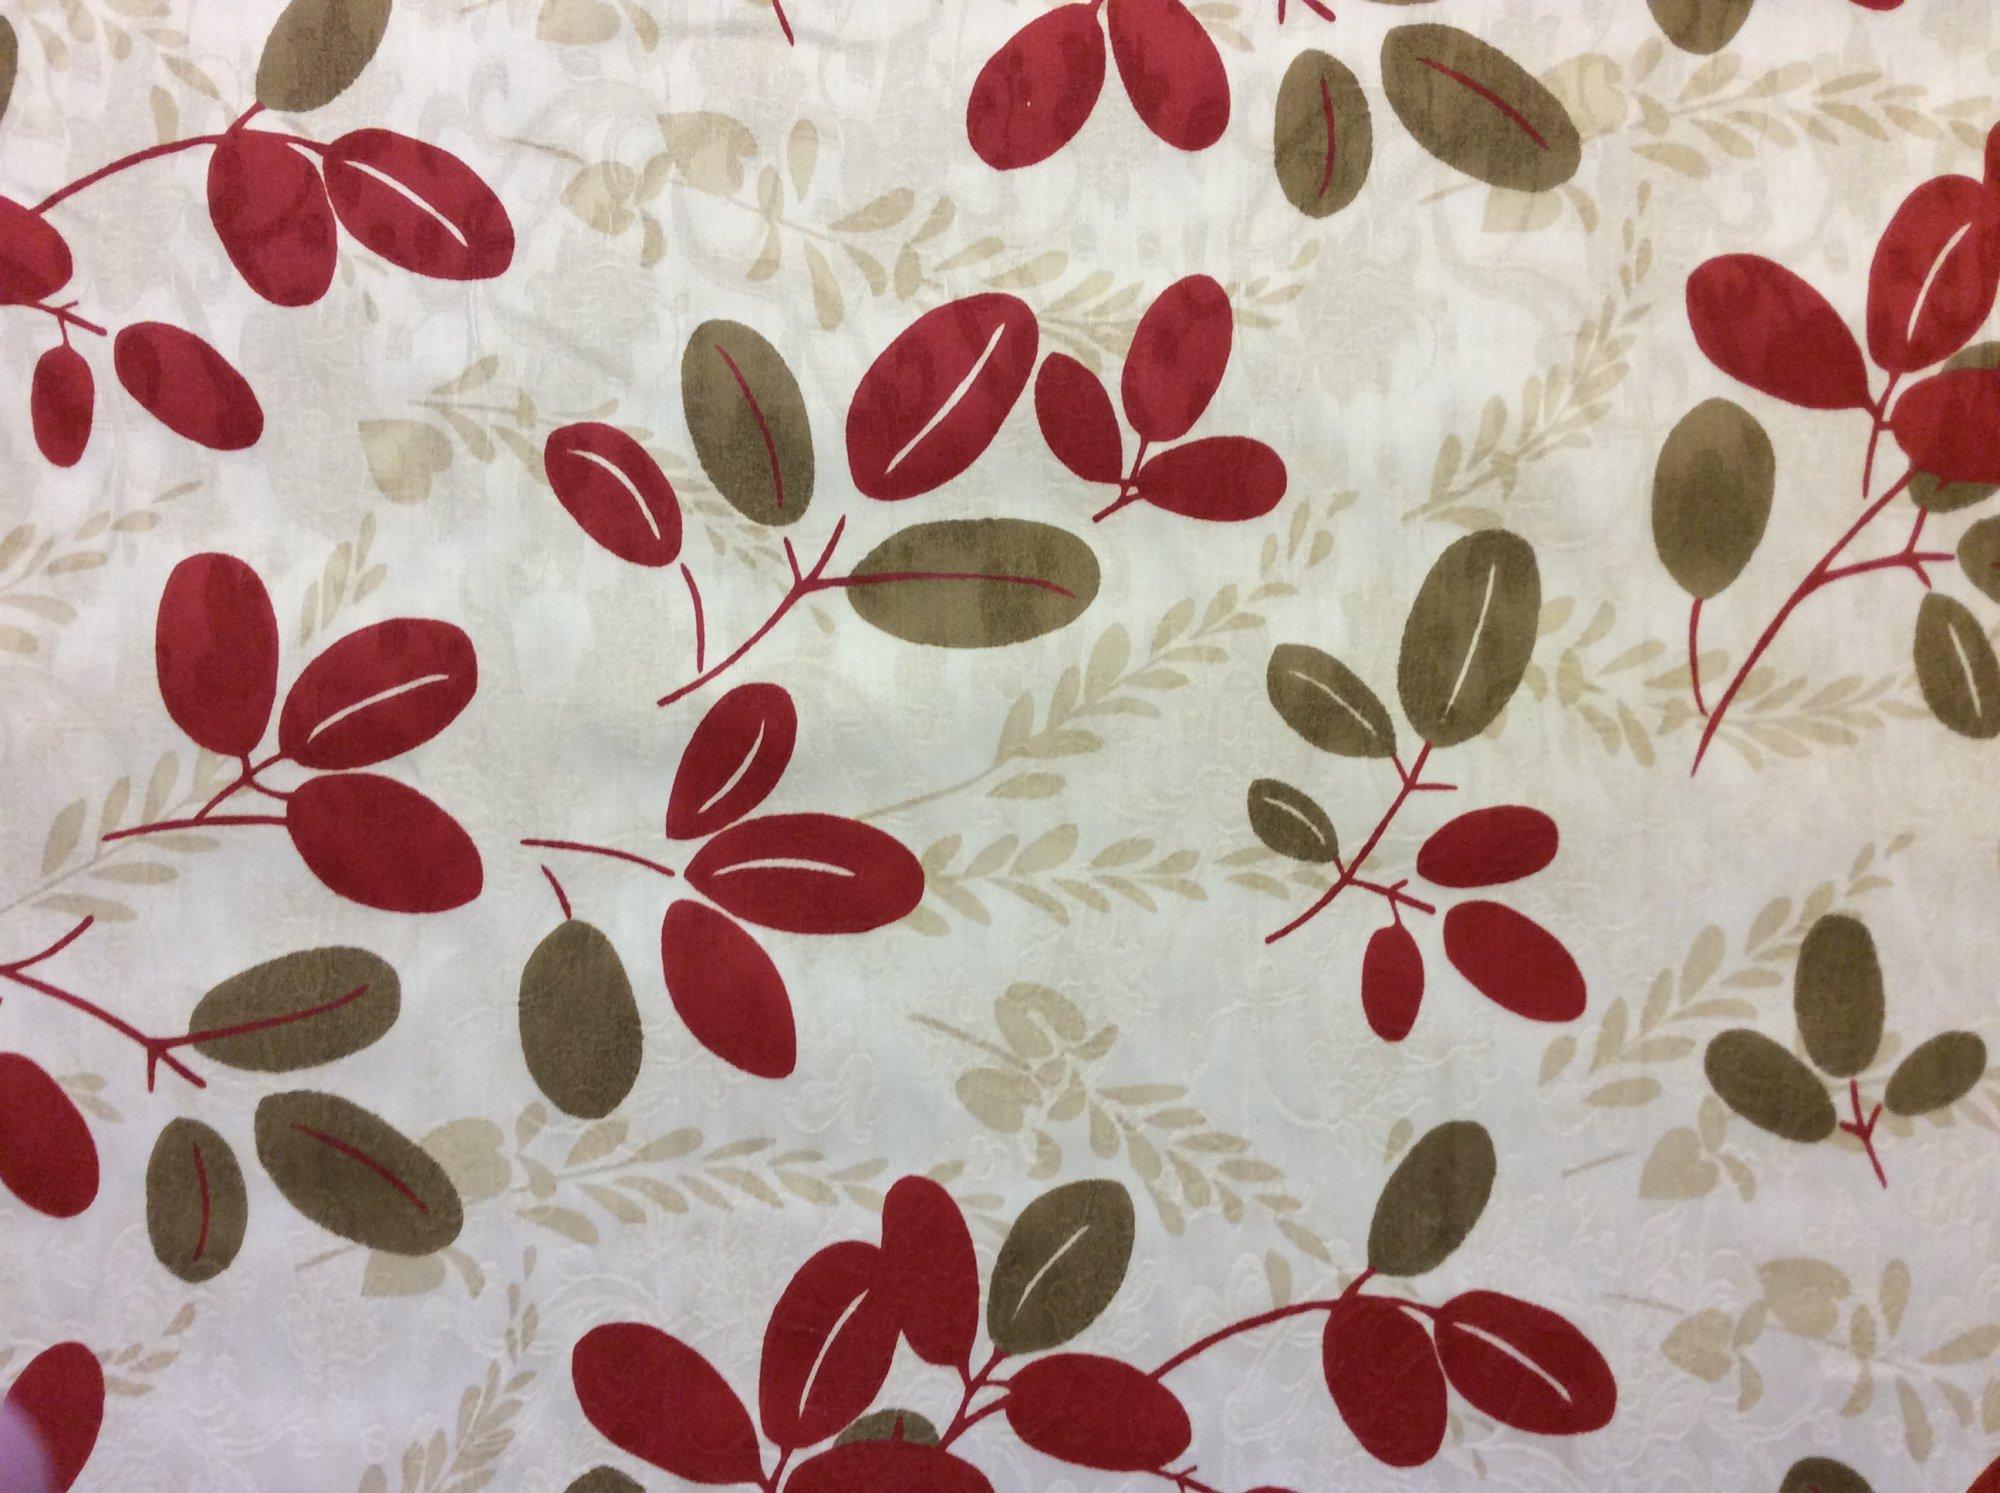 Scandinavian Modern Red Brown and Dark Cream Leaf Twig Heavy Weight Cotton Fabric Drapery Fabric HD821